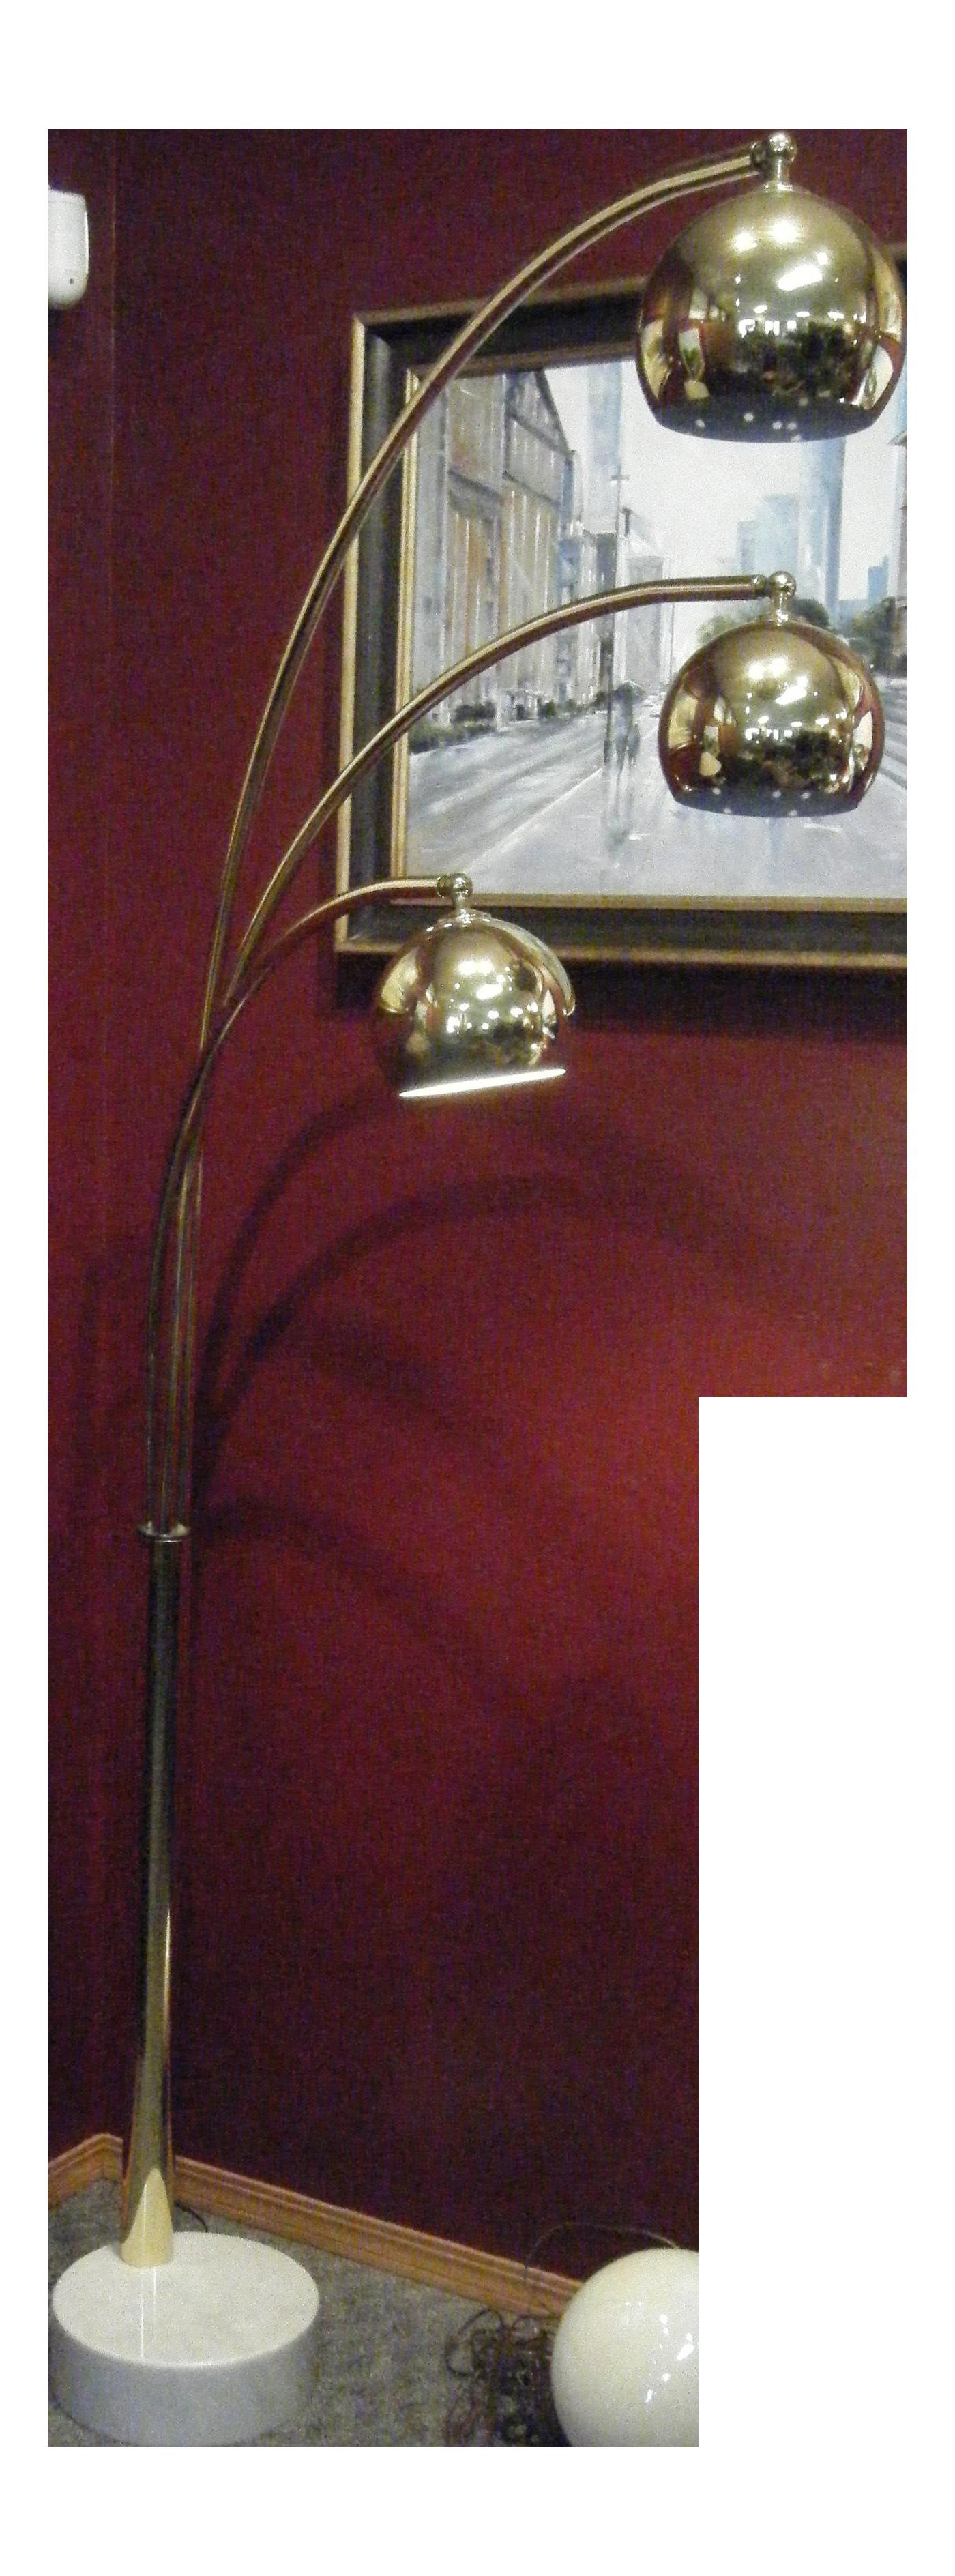 italian midcentury modern atomic brass eyeball floor lamp image 1 of 11